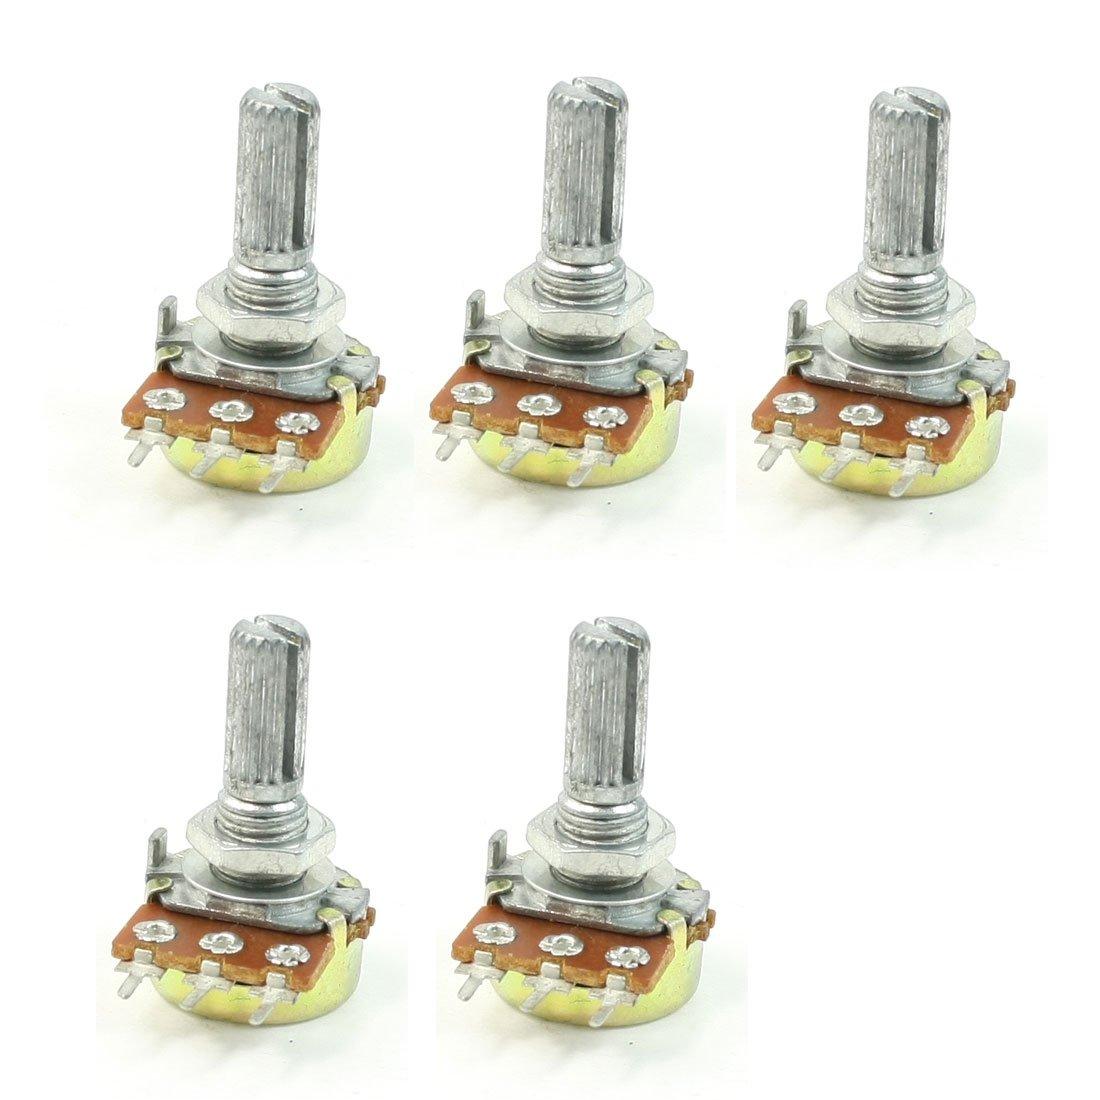 B50K 50K Ohm Adjustment Single Linear Rotary Taper Potentiometer 5 Pcs Sourcingmap a13061400ux0446